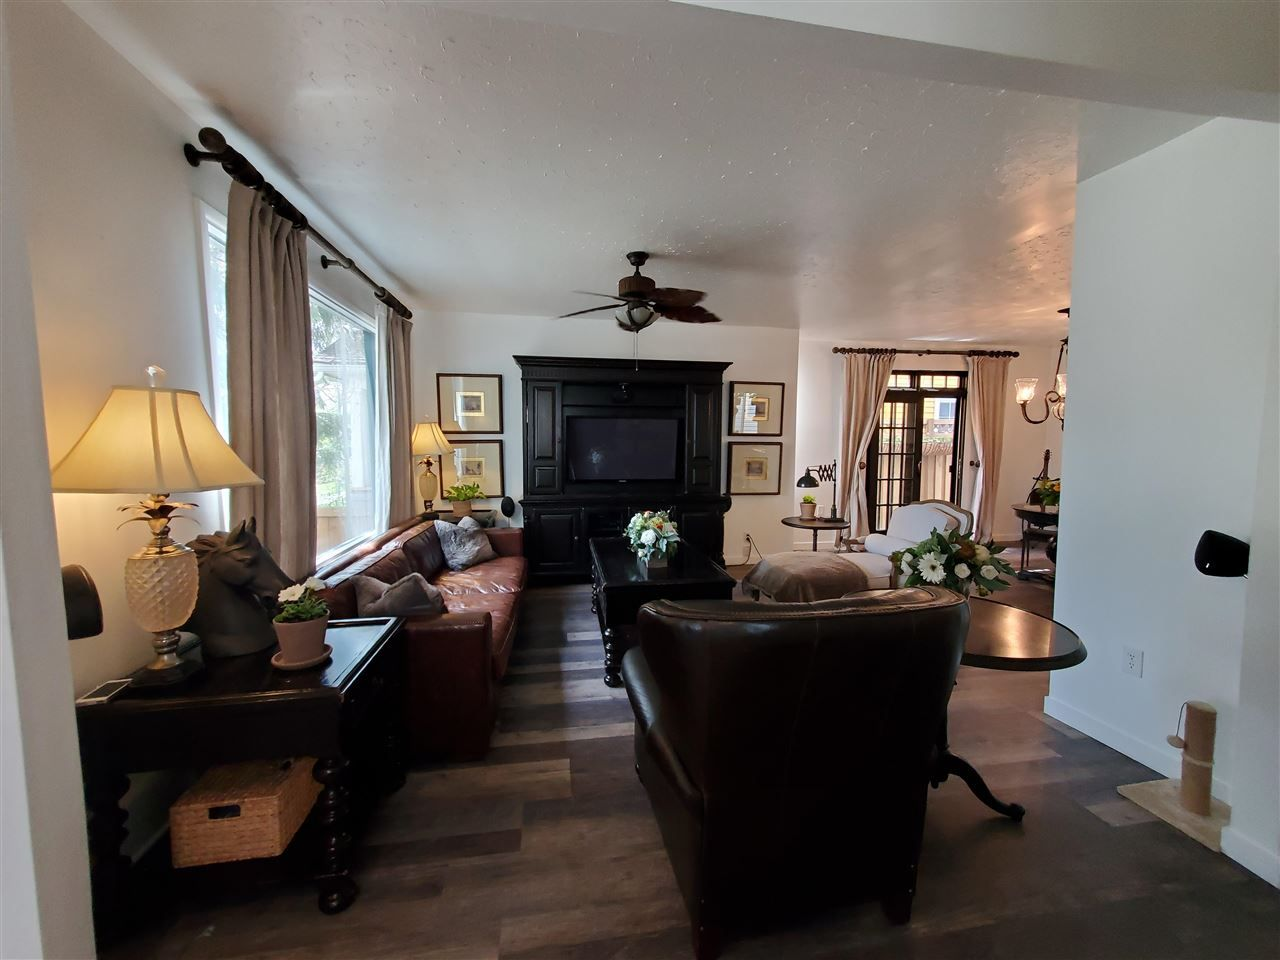 Main Photo: 11236 96 Street in Edmonton: Zone 05 House for sale : MLS®# E4244610